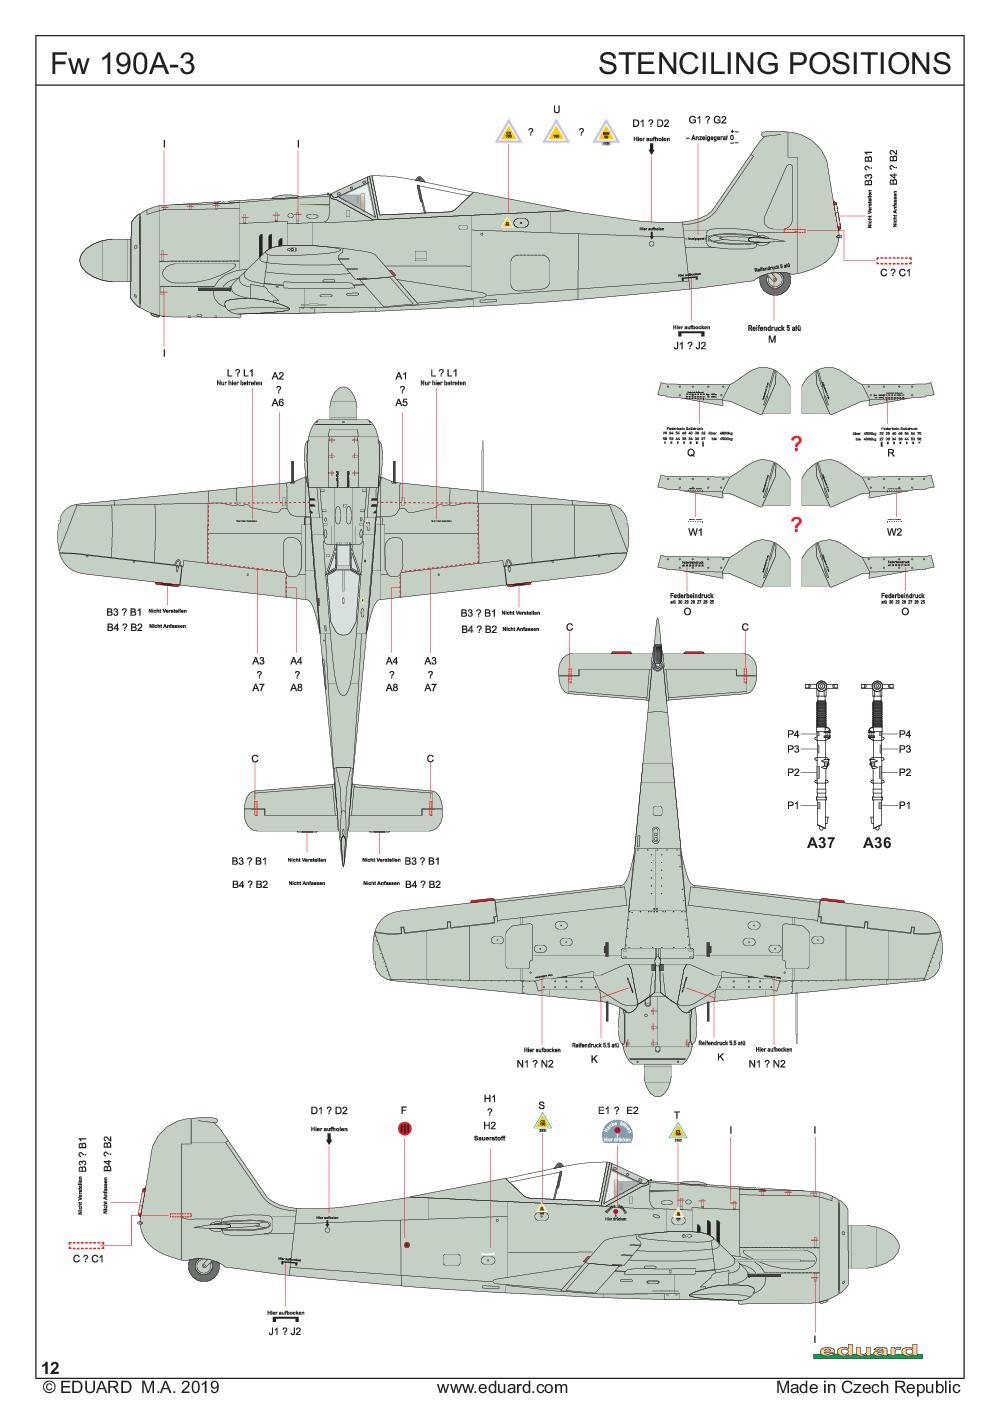 Eduard-84112-FW-190-A-3-WEEKEND-32 FW 190 A-3 in 1:48 als WEEKEND-kit von Eduard # 84112